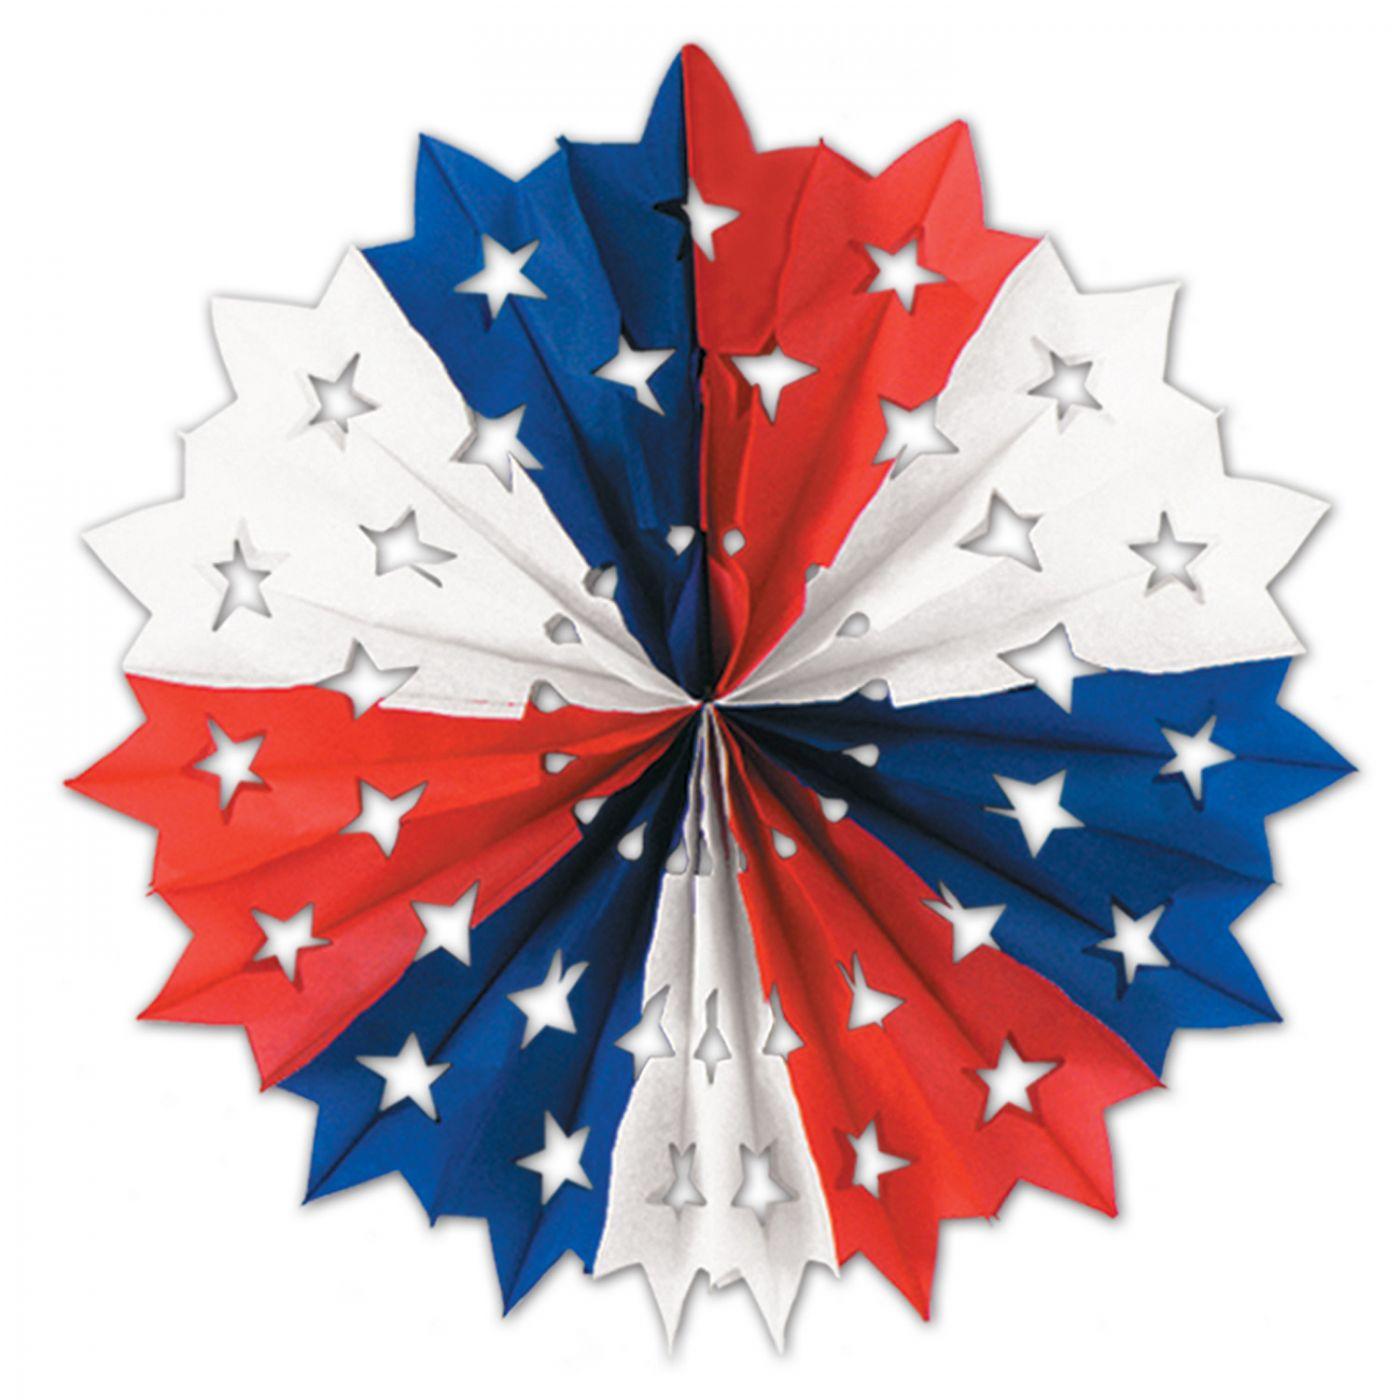 Patriotic Star Fan image